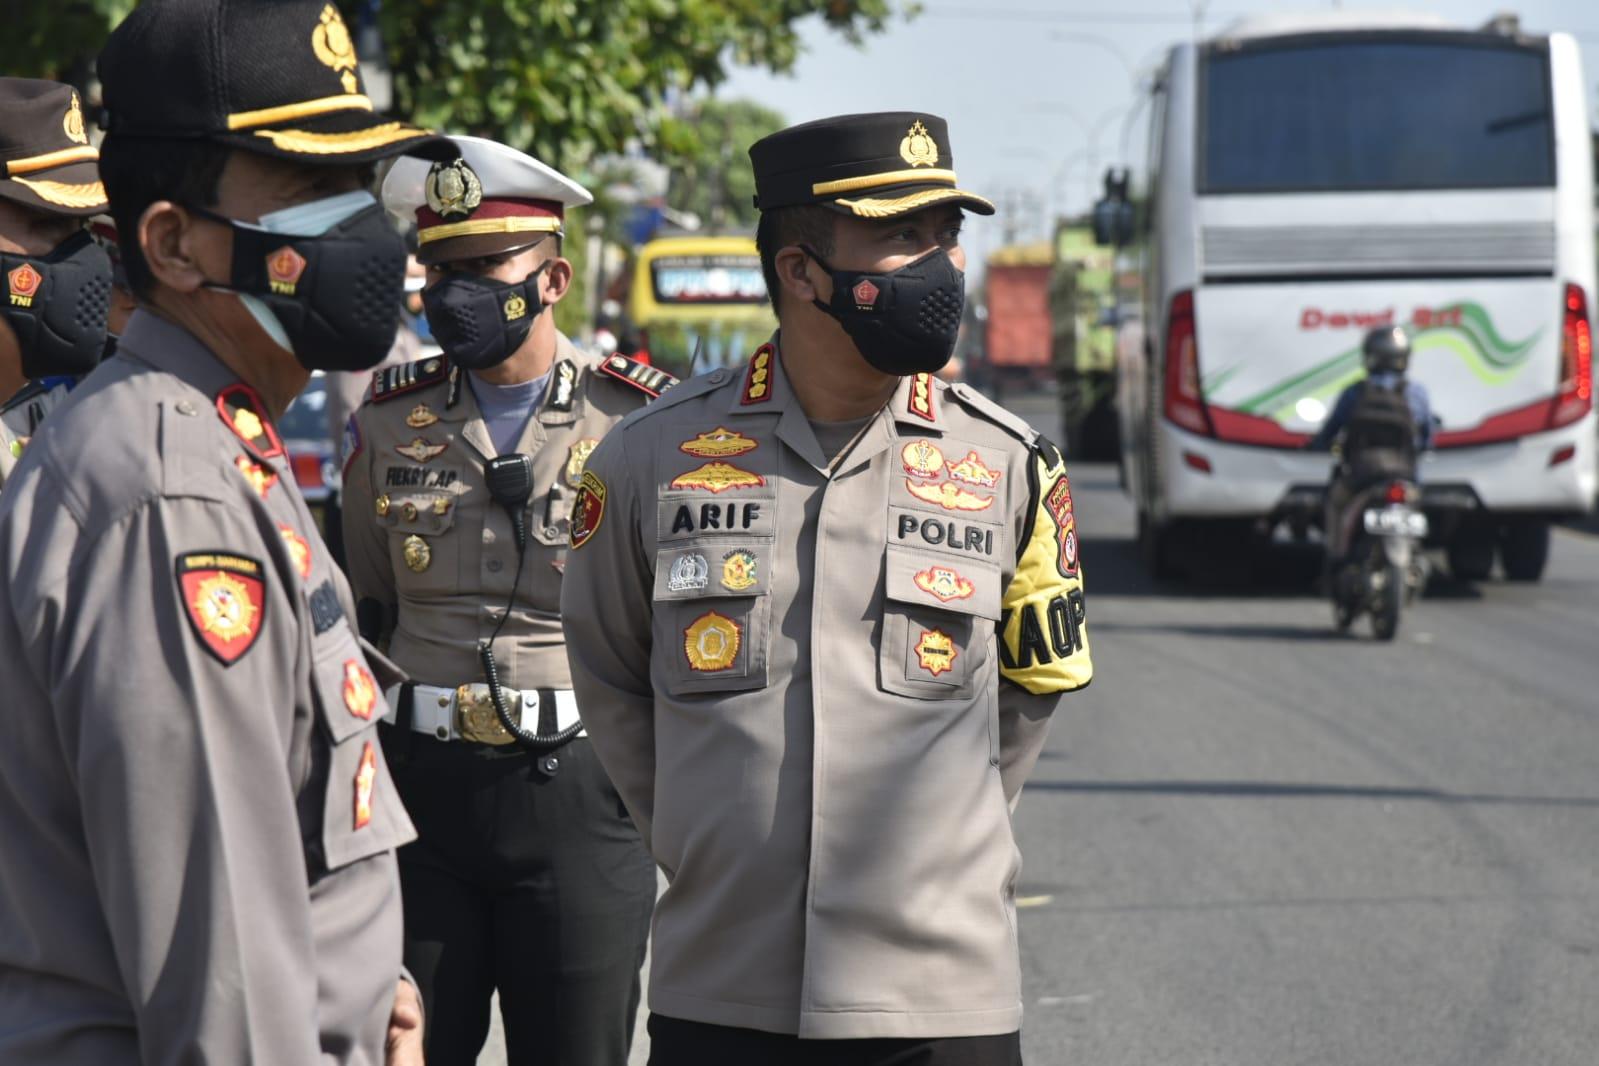 Antisipasi Libur Idul Adha, Polresta Cirebon Gelar Penyekatan Jalur Tol dan Non Tol